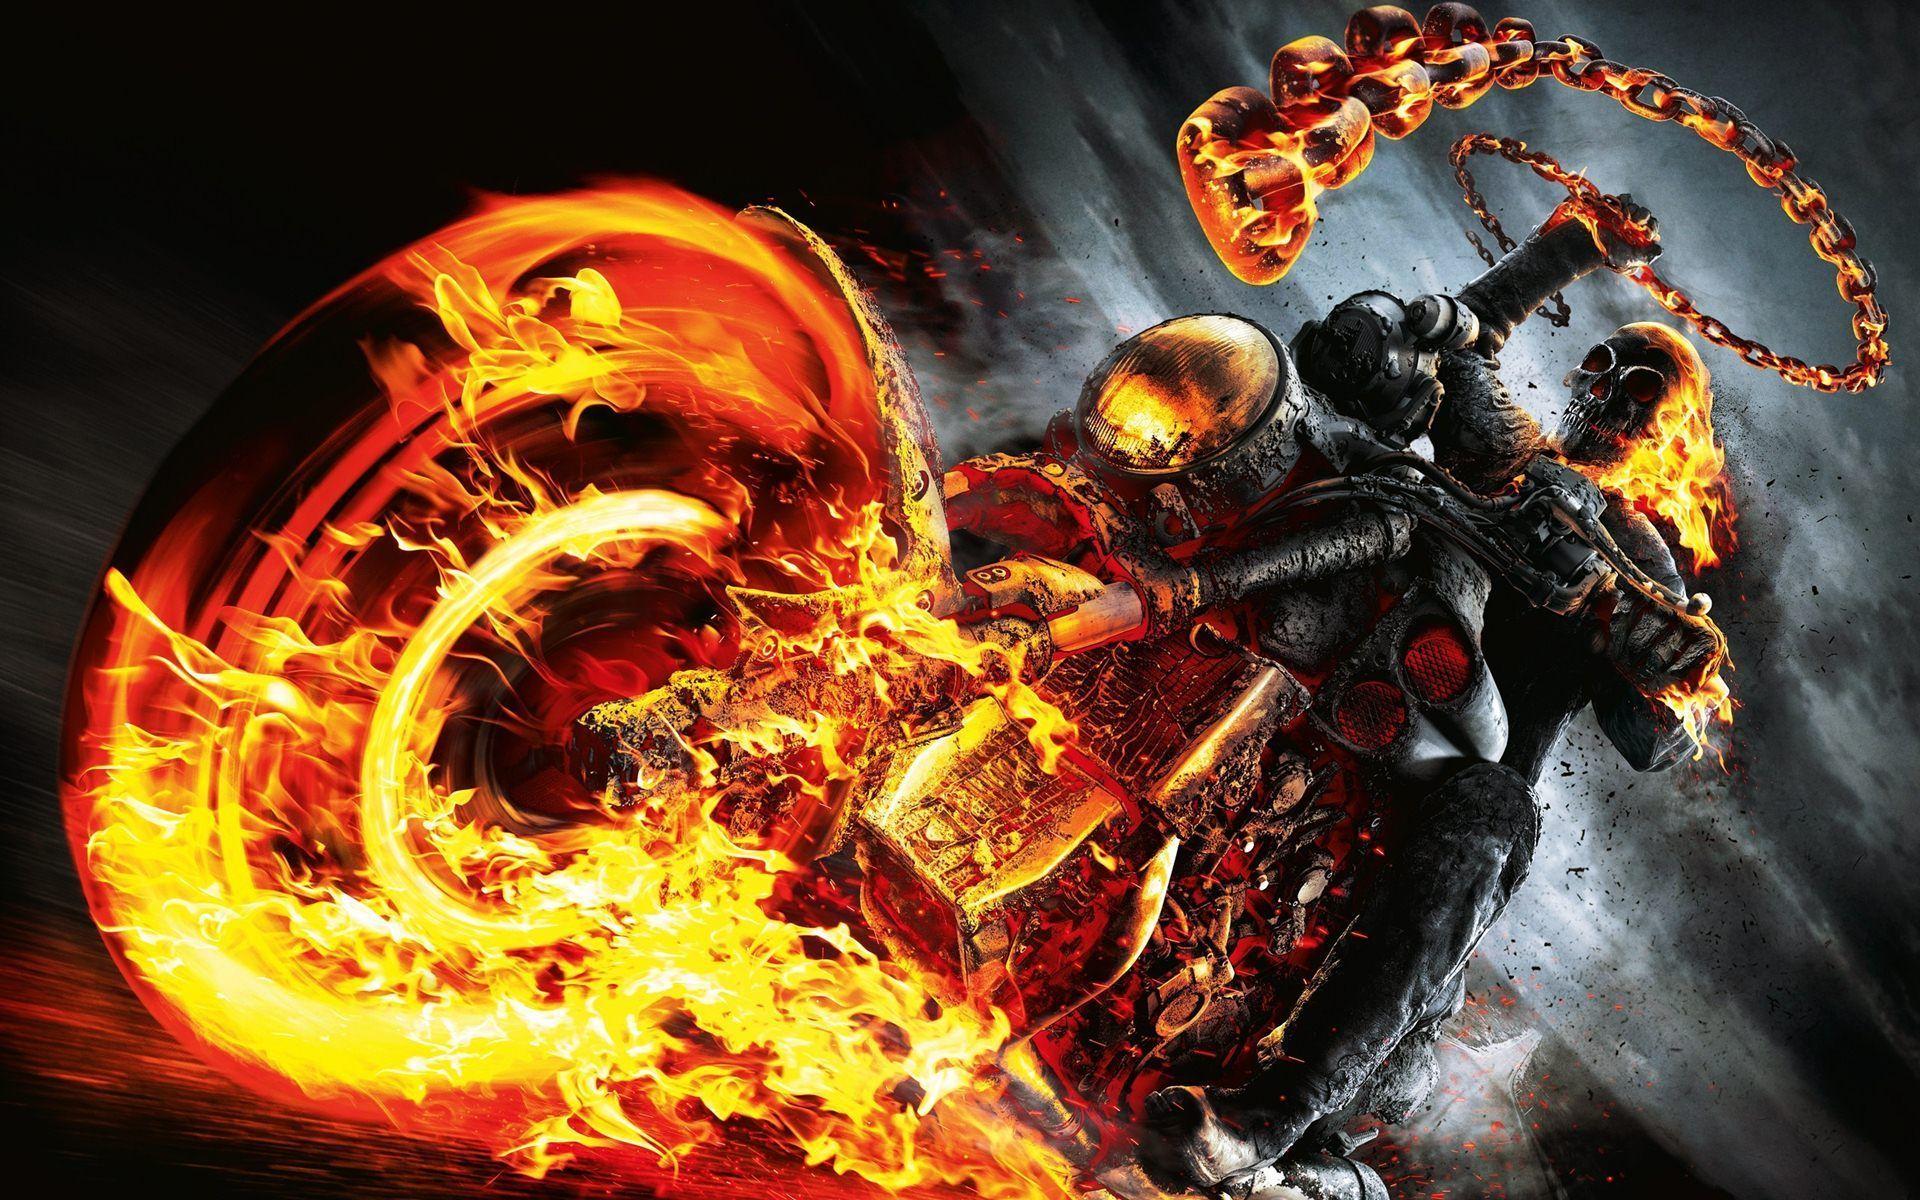 Top Wallpaper Horse Ghost Rider - d8ca34686b60f1a127ce262da24fc0fb  Perfect Image Reference_983283.jpg